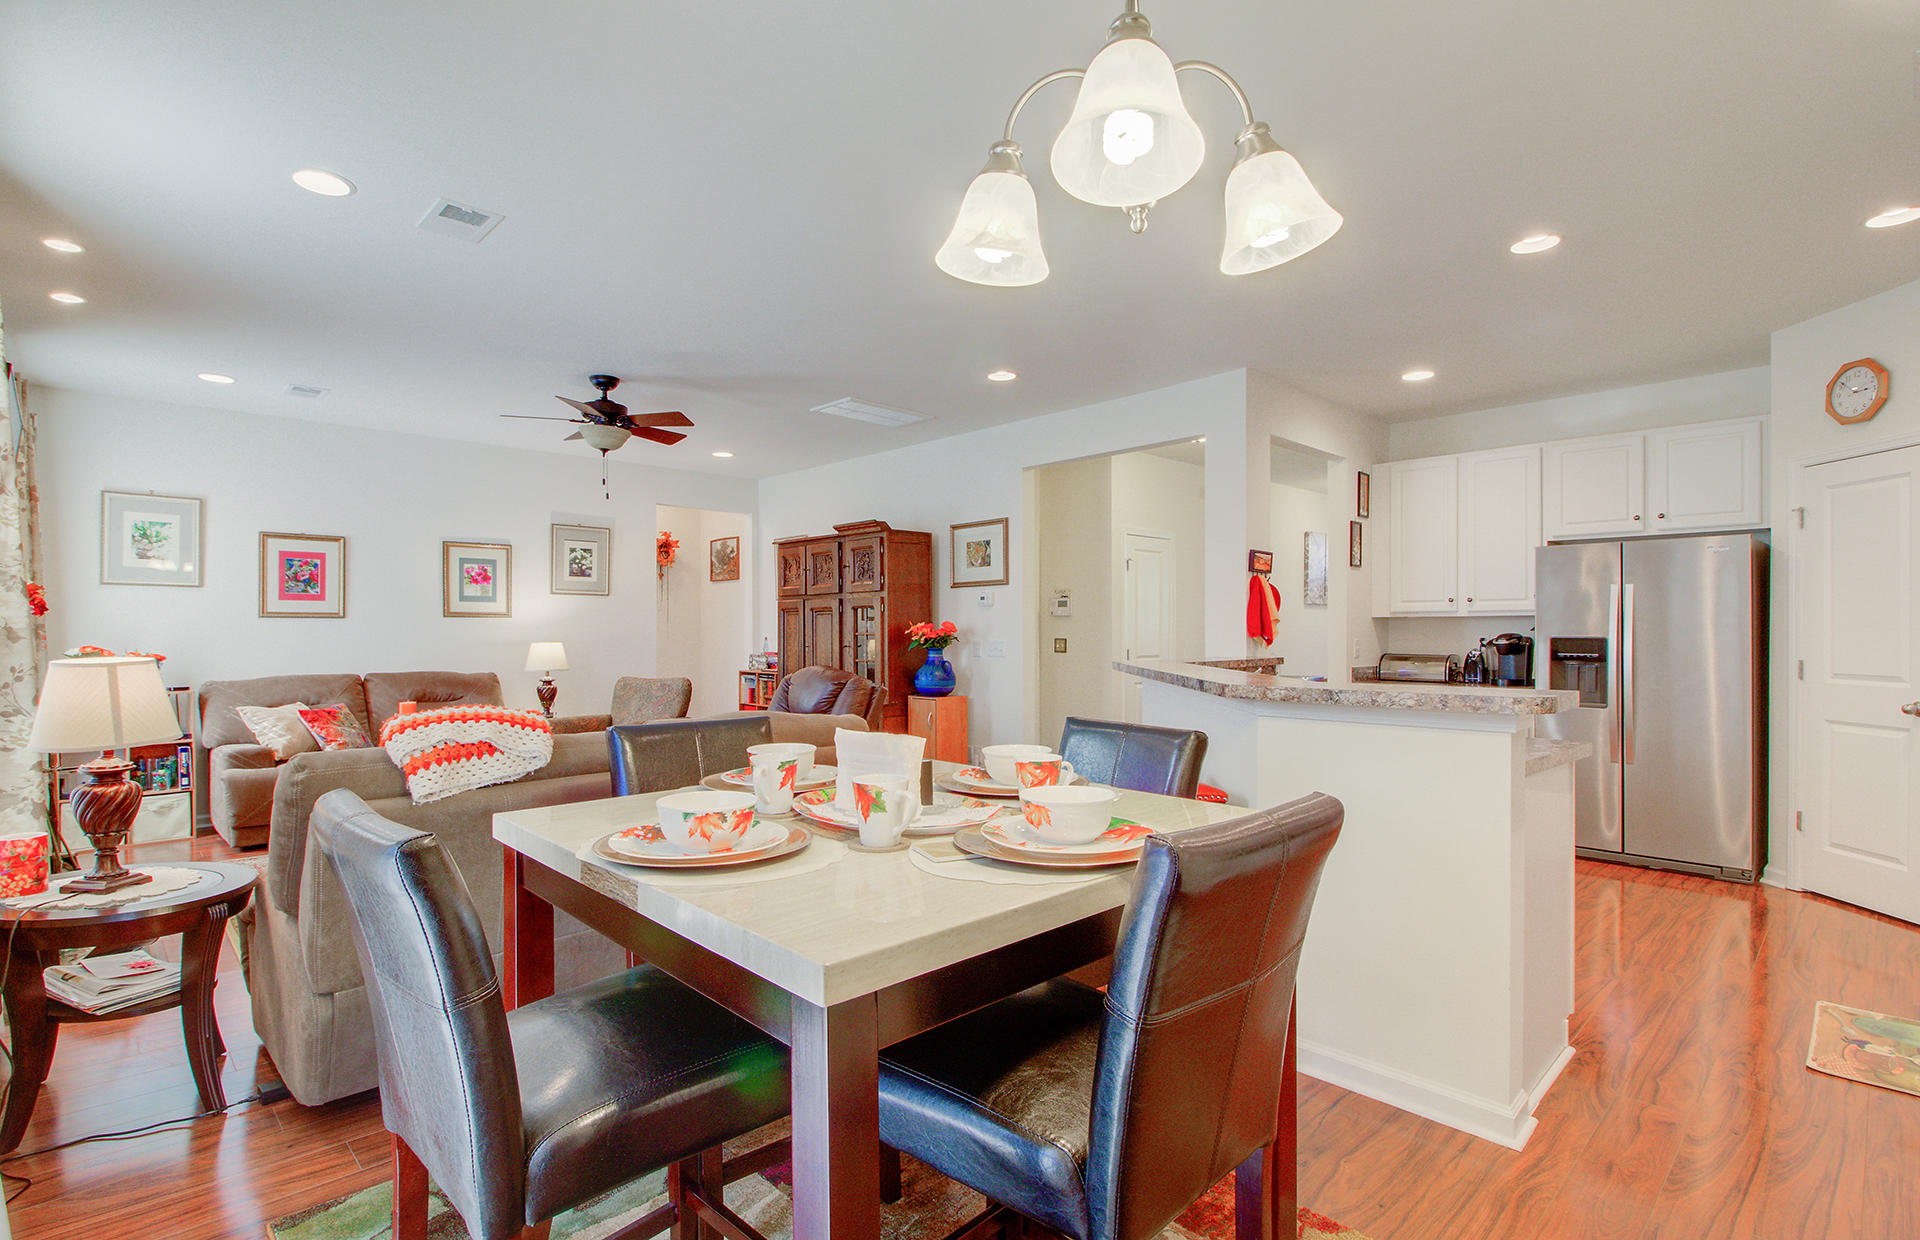 Cane Bay Plantation Homes For Sale - 255 Spectrum, Summerville, SC - 9